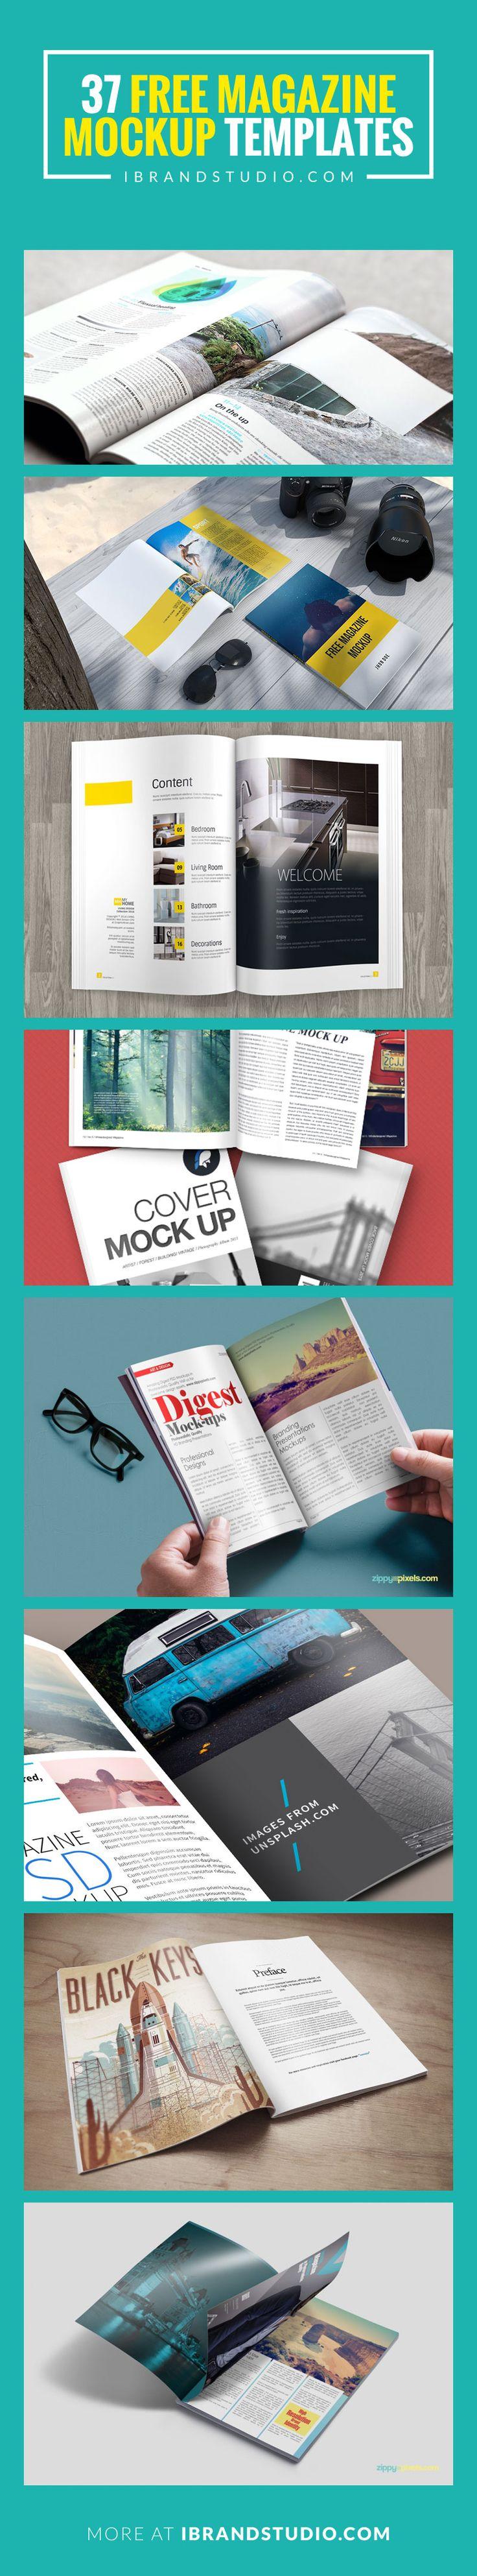 Magazine Mockup Templates (PSD) - Free Download! #mockup #psd